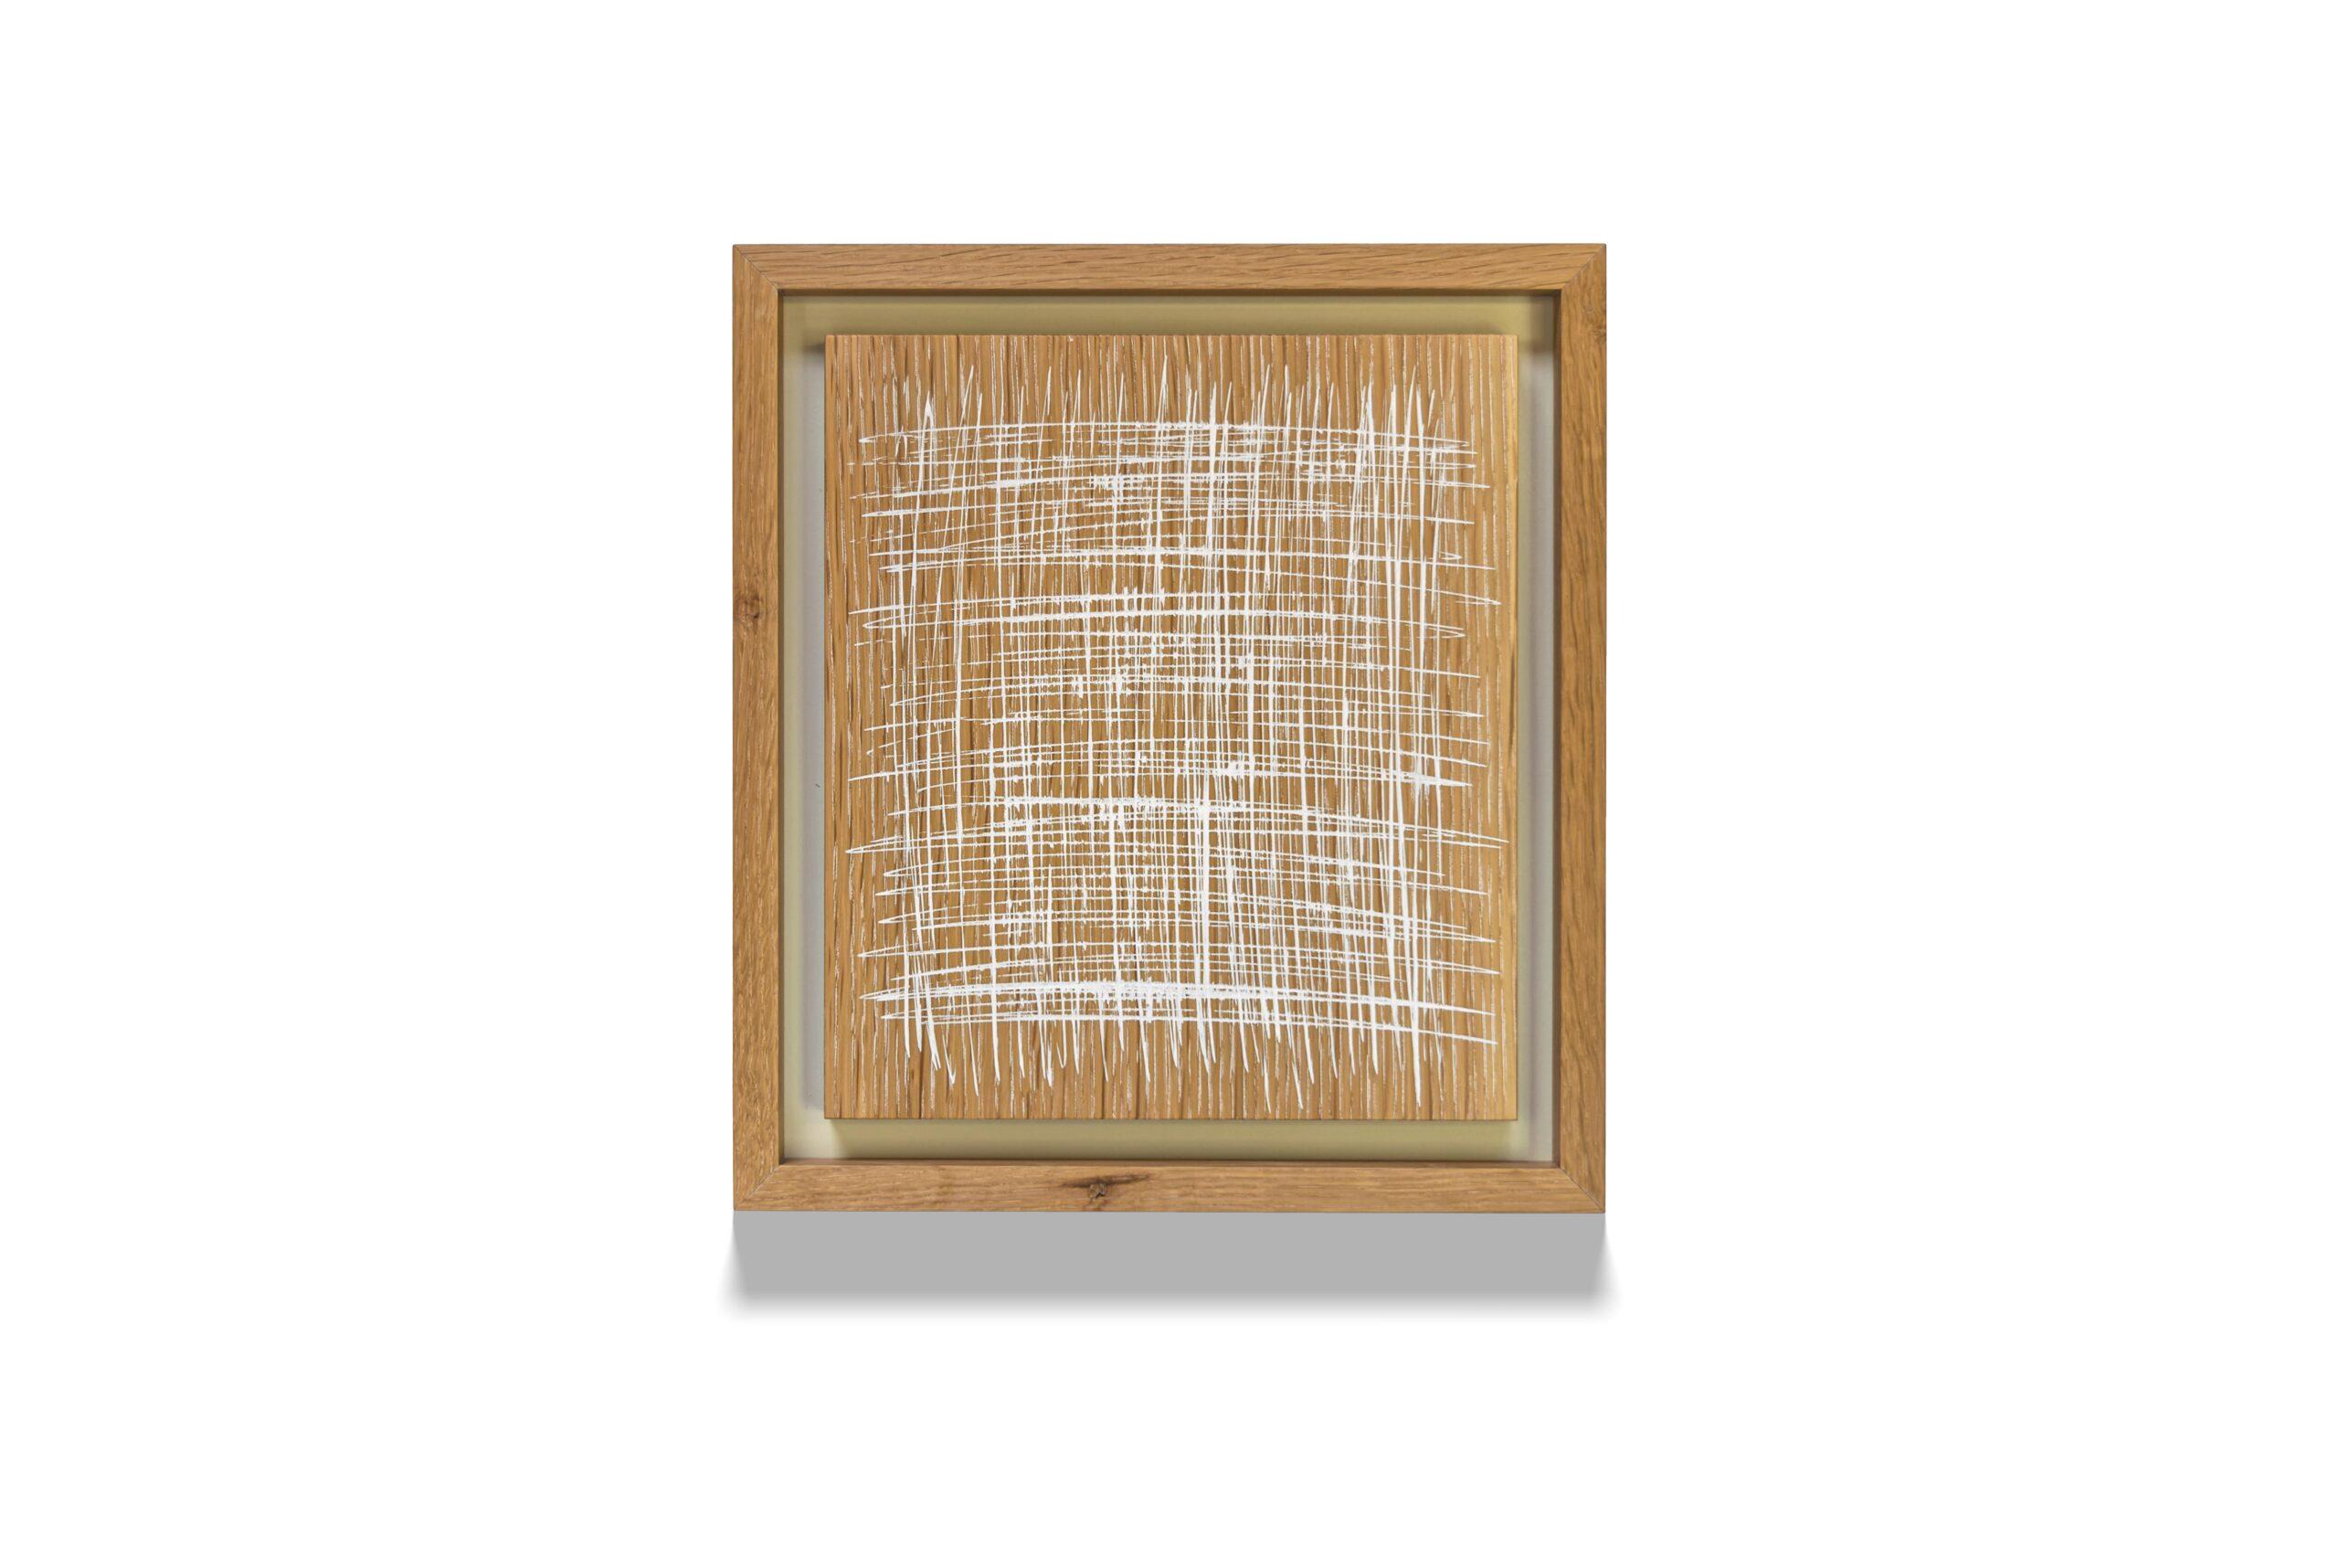 White Oak Skritch wood drawing